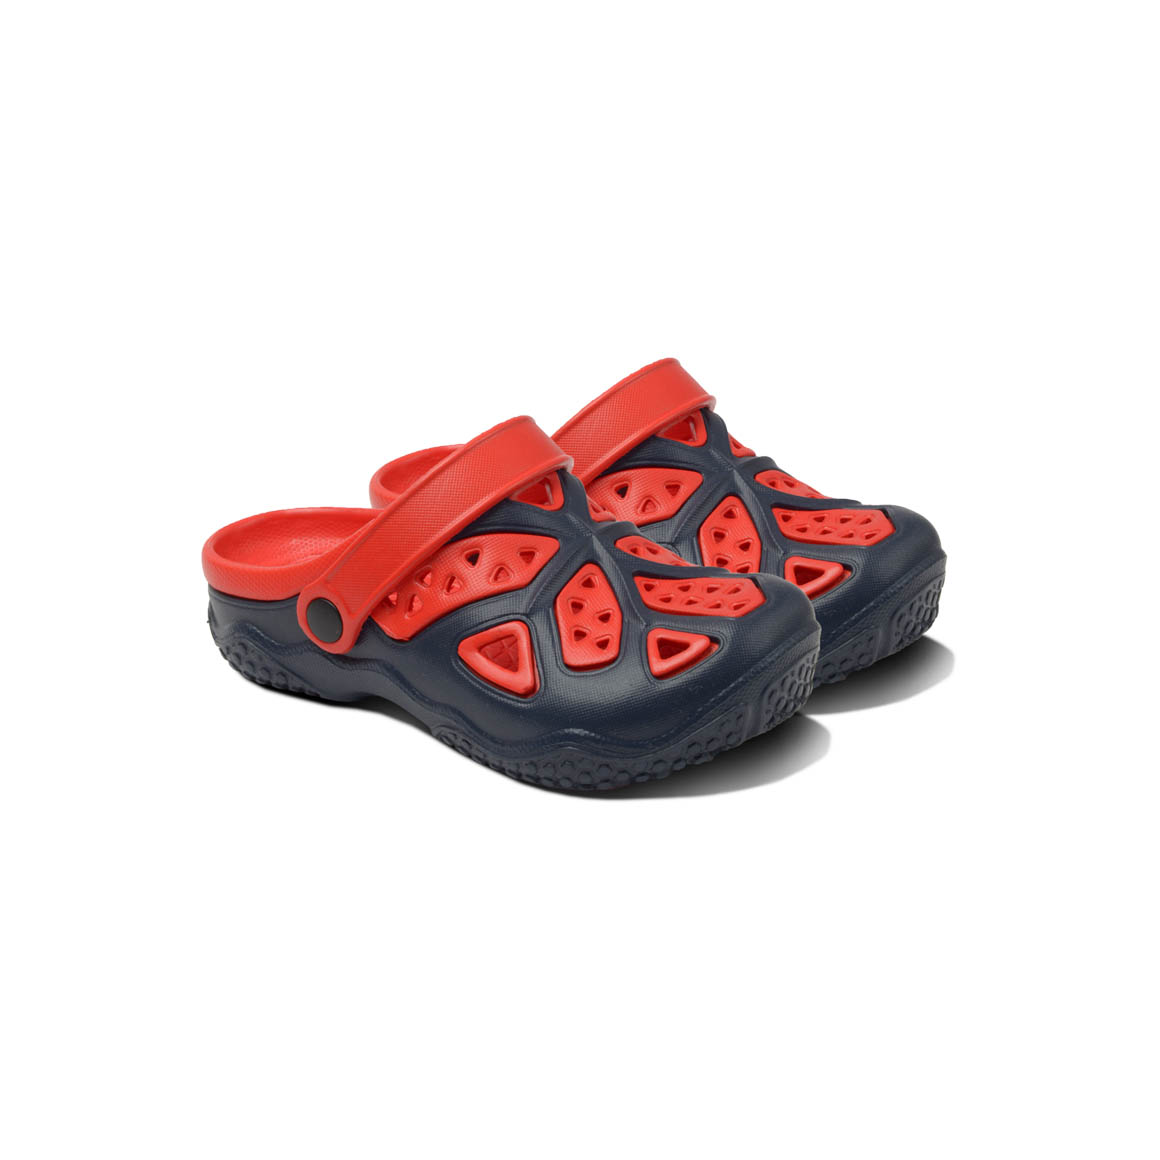 Kids Lightweight Clogs - Navy/Red | Trada Marketplace